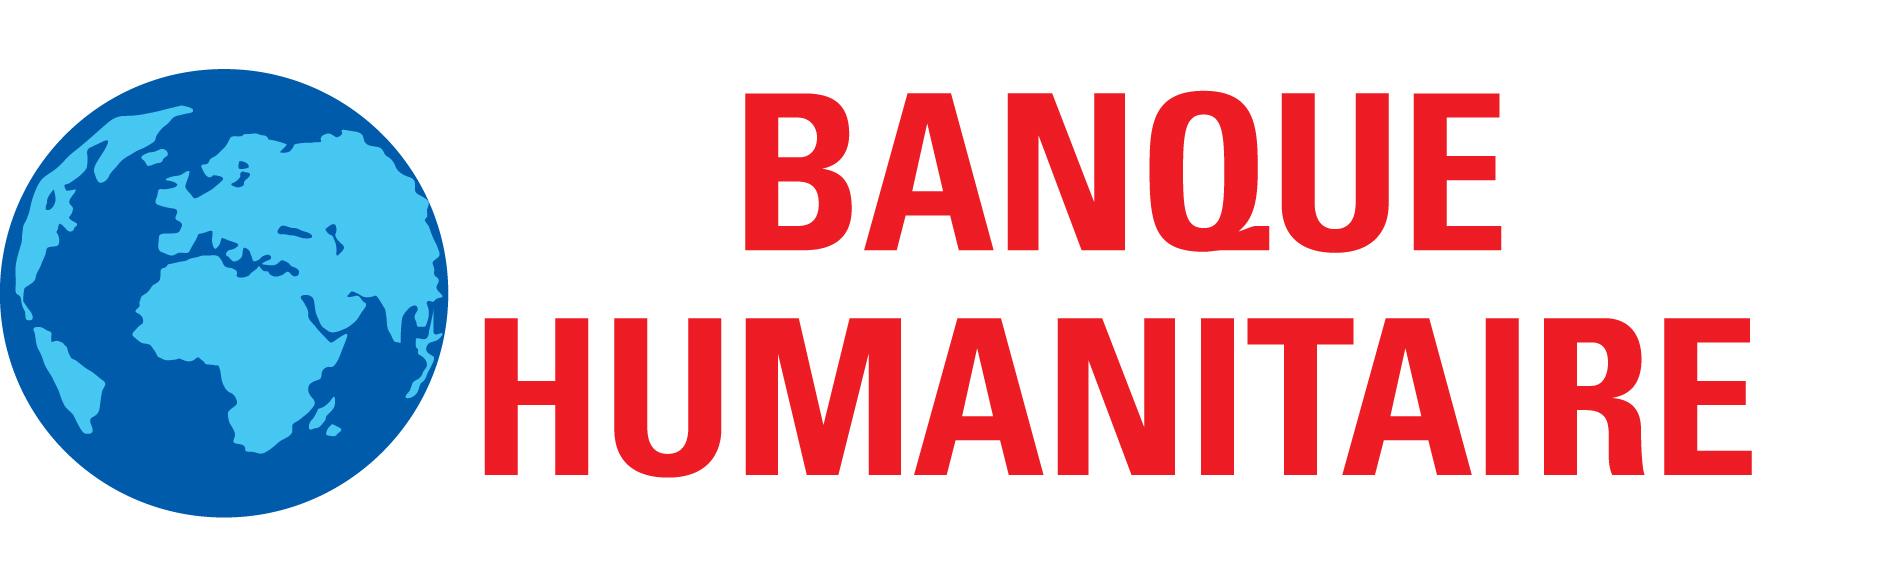 Logo Banque humanitaire.jpg